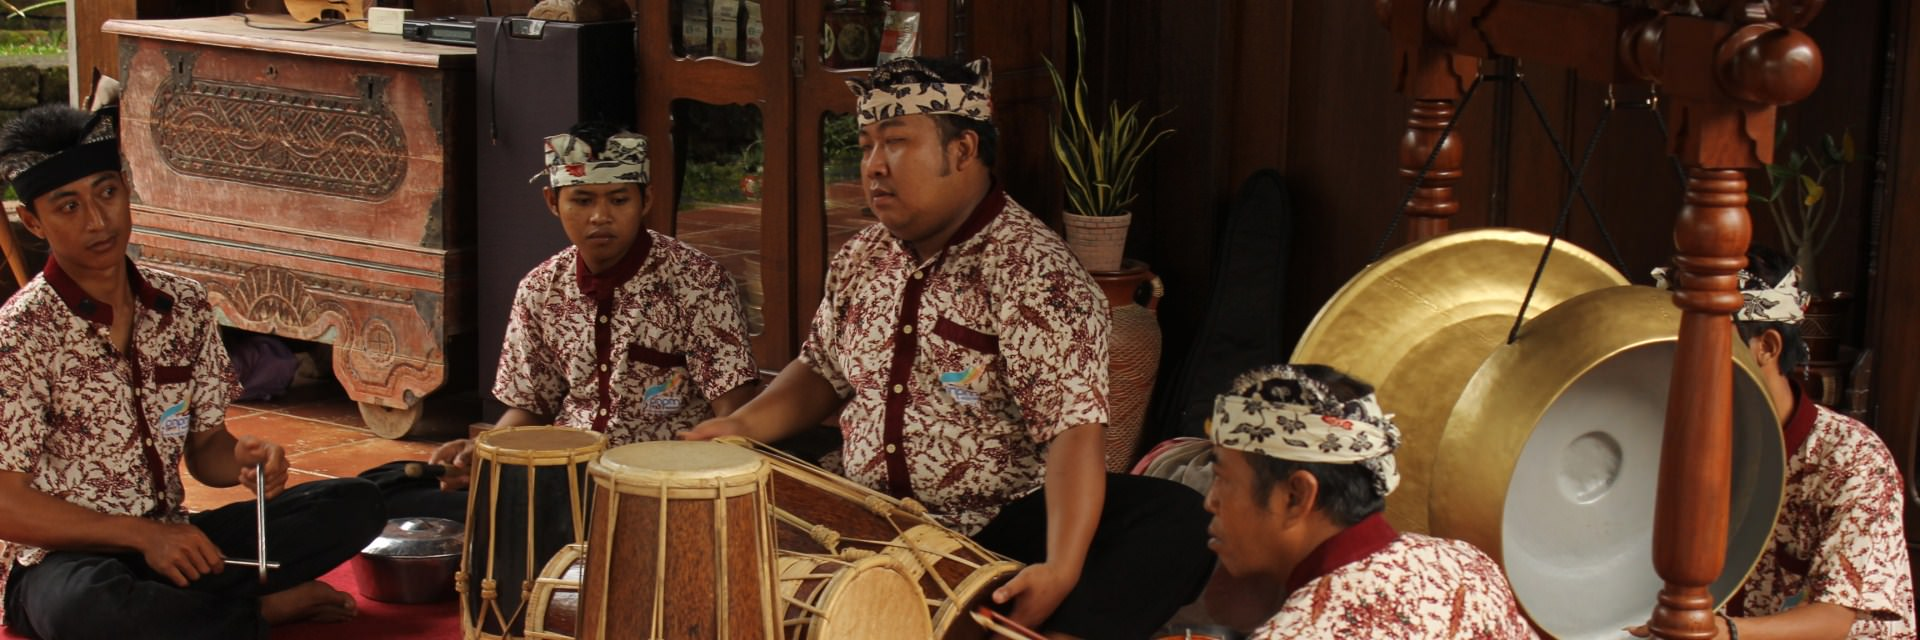 5 Tradisi Unik Suku Osing Banyuwangi 5 Tradisi Unik Suku Osing Banyuwangi - Dolan Dolen